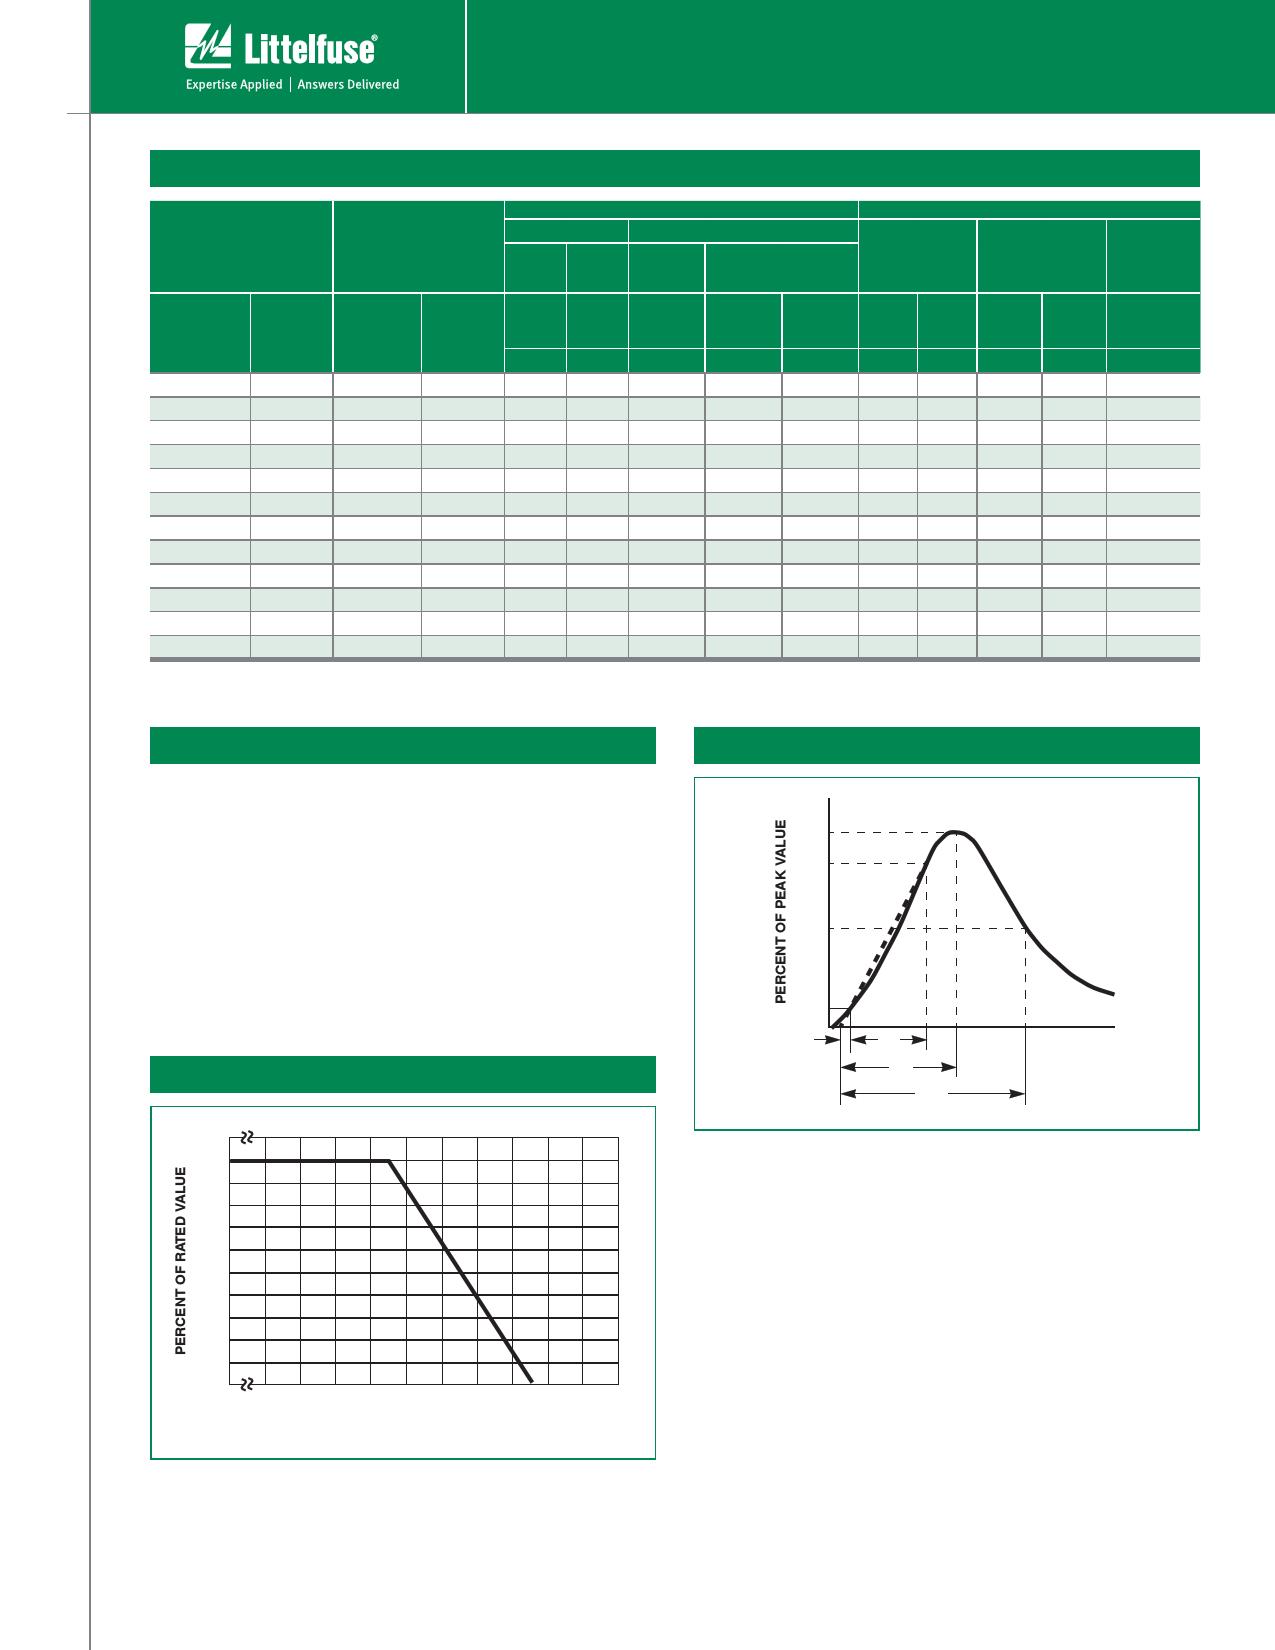 V07E250 pdf, 電子部品, 半導体, ピン配列